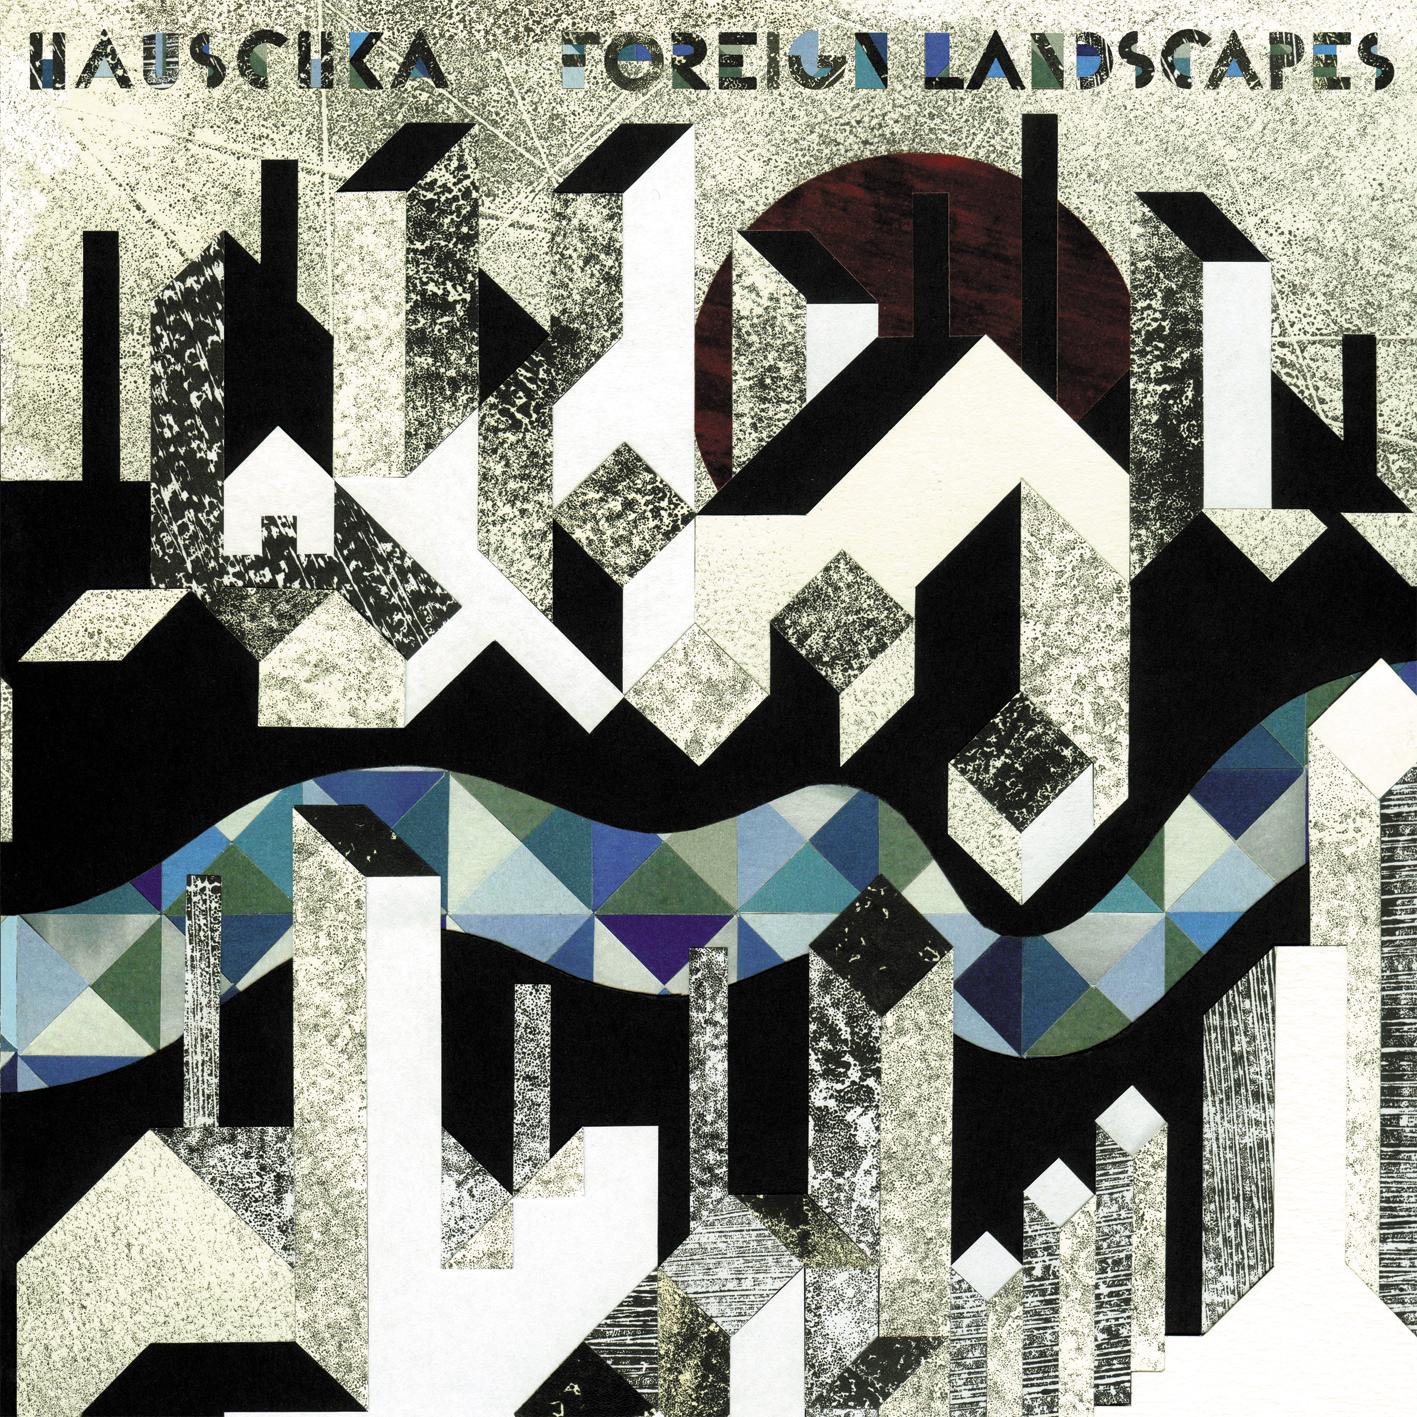 Foreign Landscapes